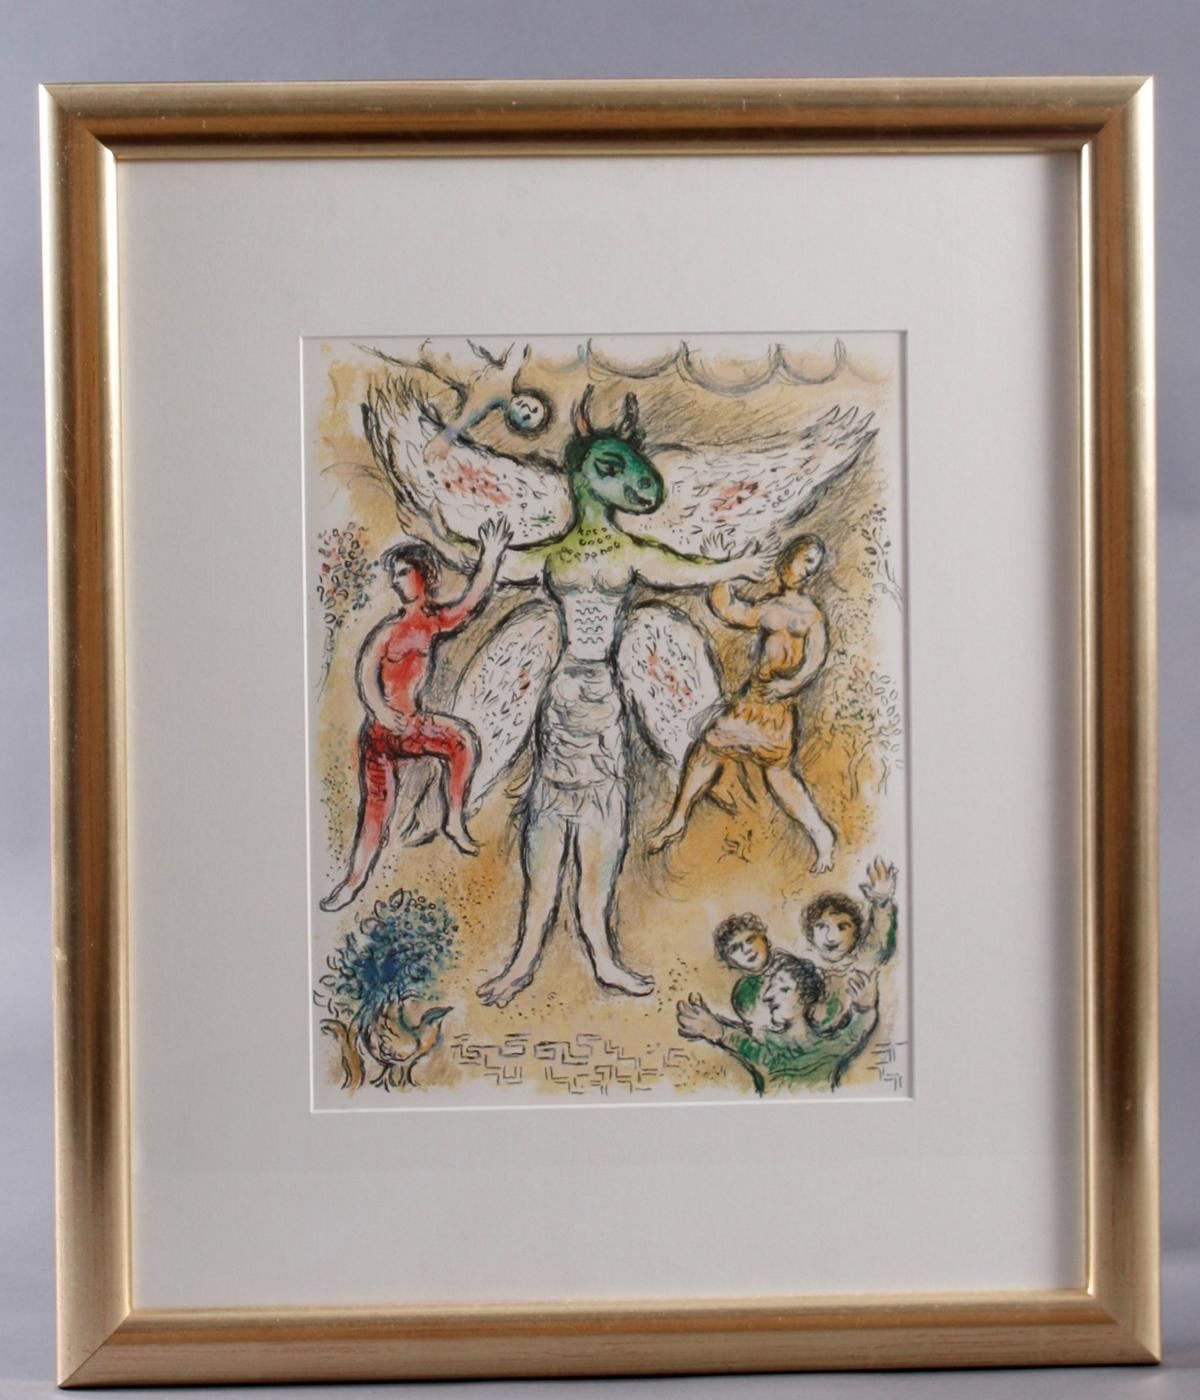 Marc Chagall, Farblithografie aus der Odyssee